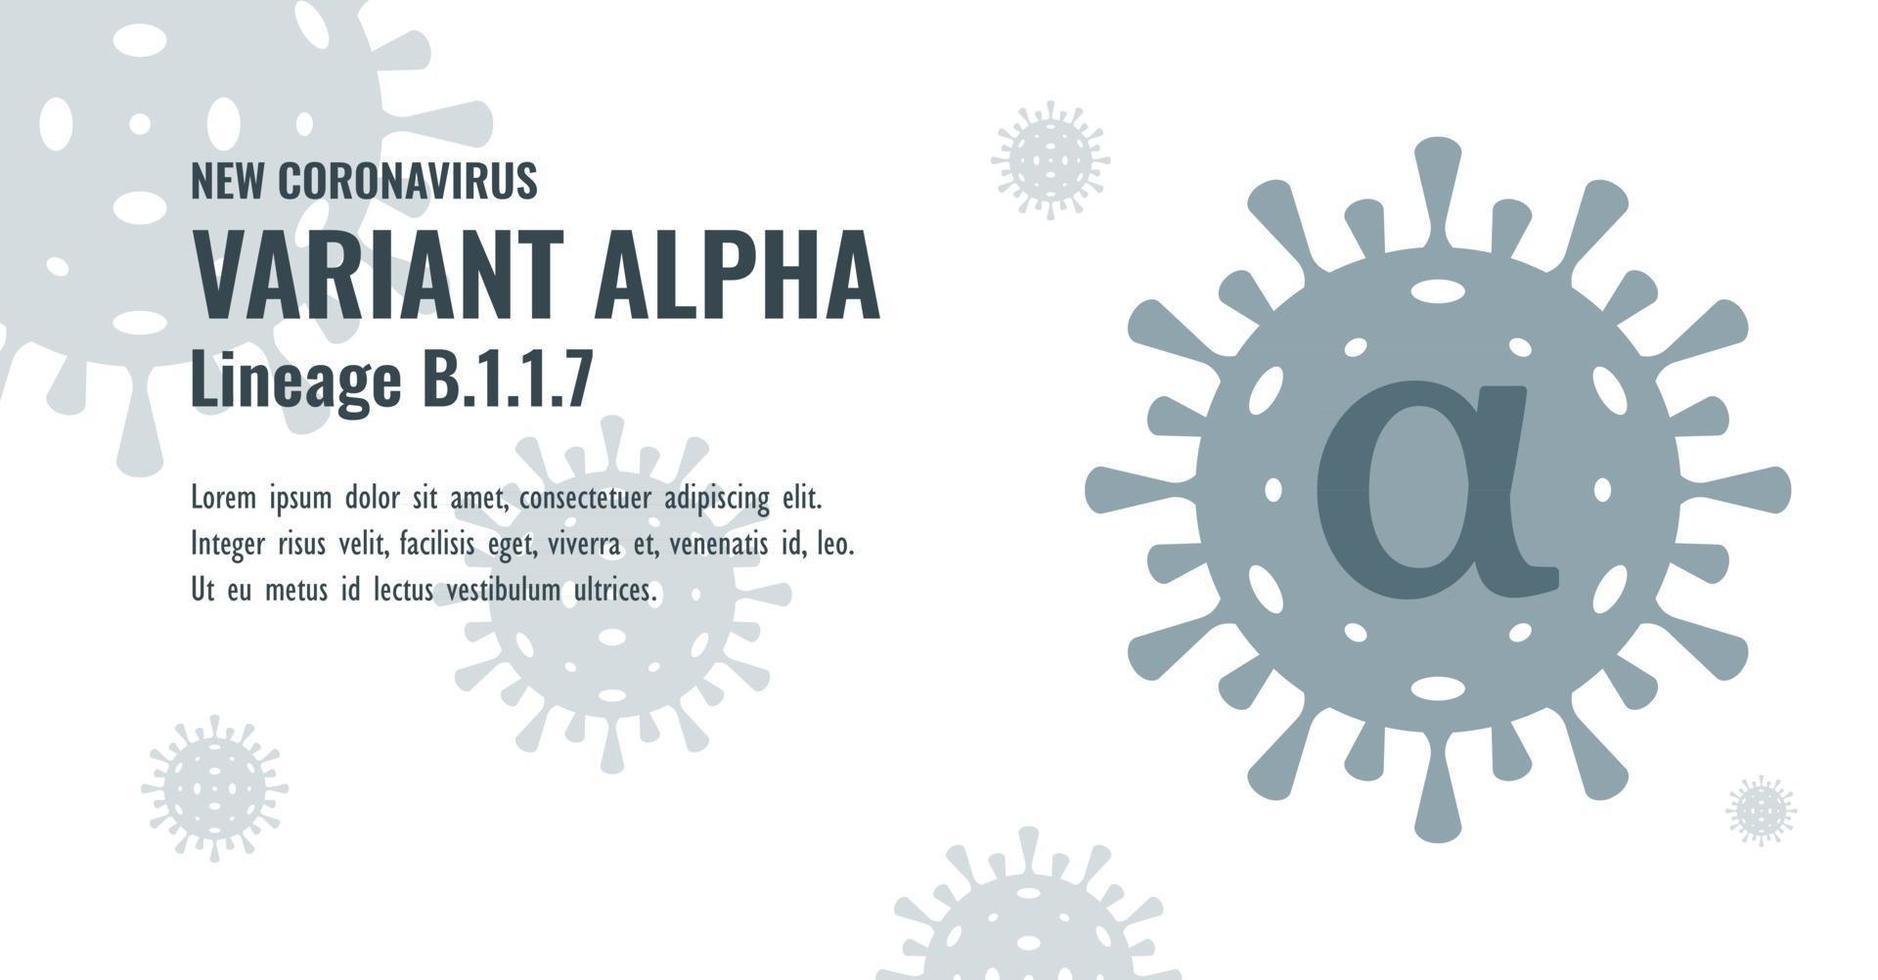 New Coronavirus or SARS-CoV-2 Variant Alpha B.1.1.7 Illustration vector